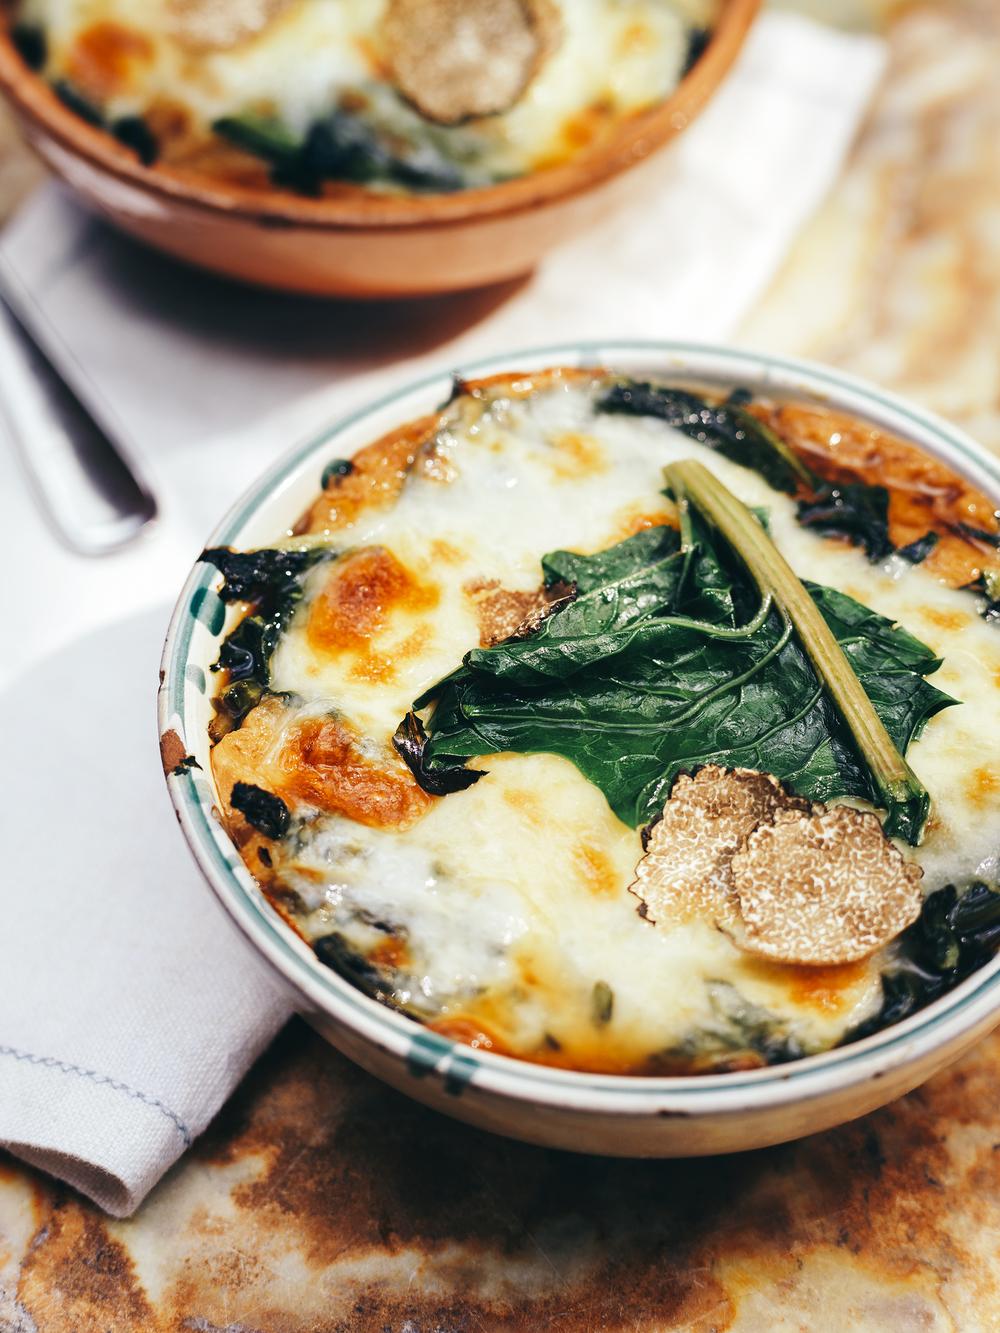 edulis restaurant truffles soup cheese dinner toronto